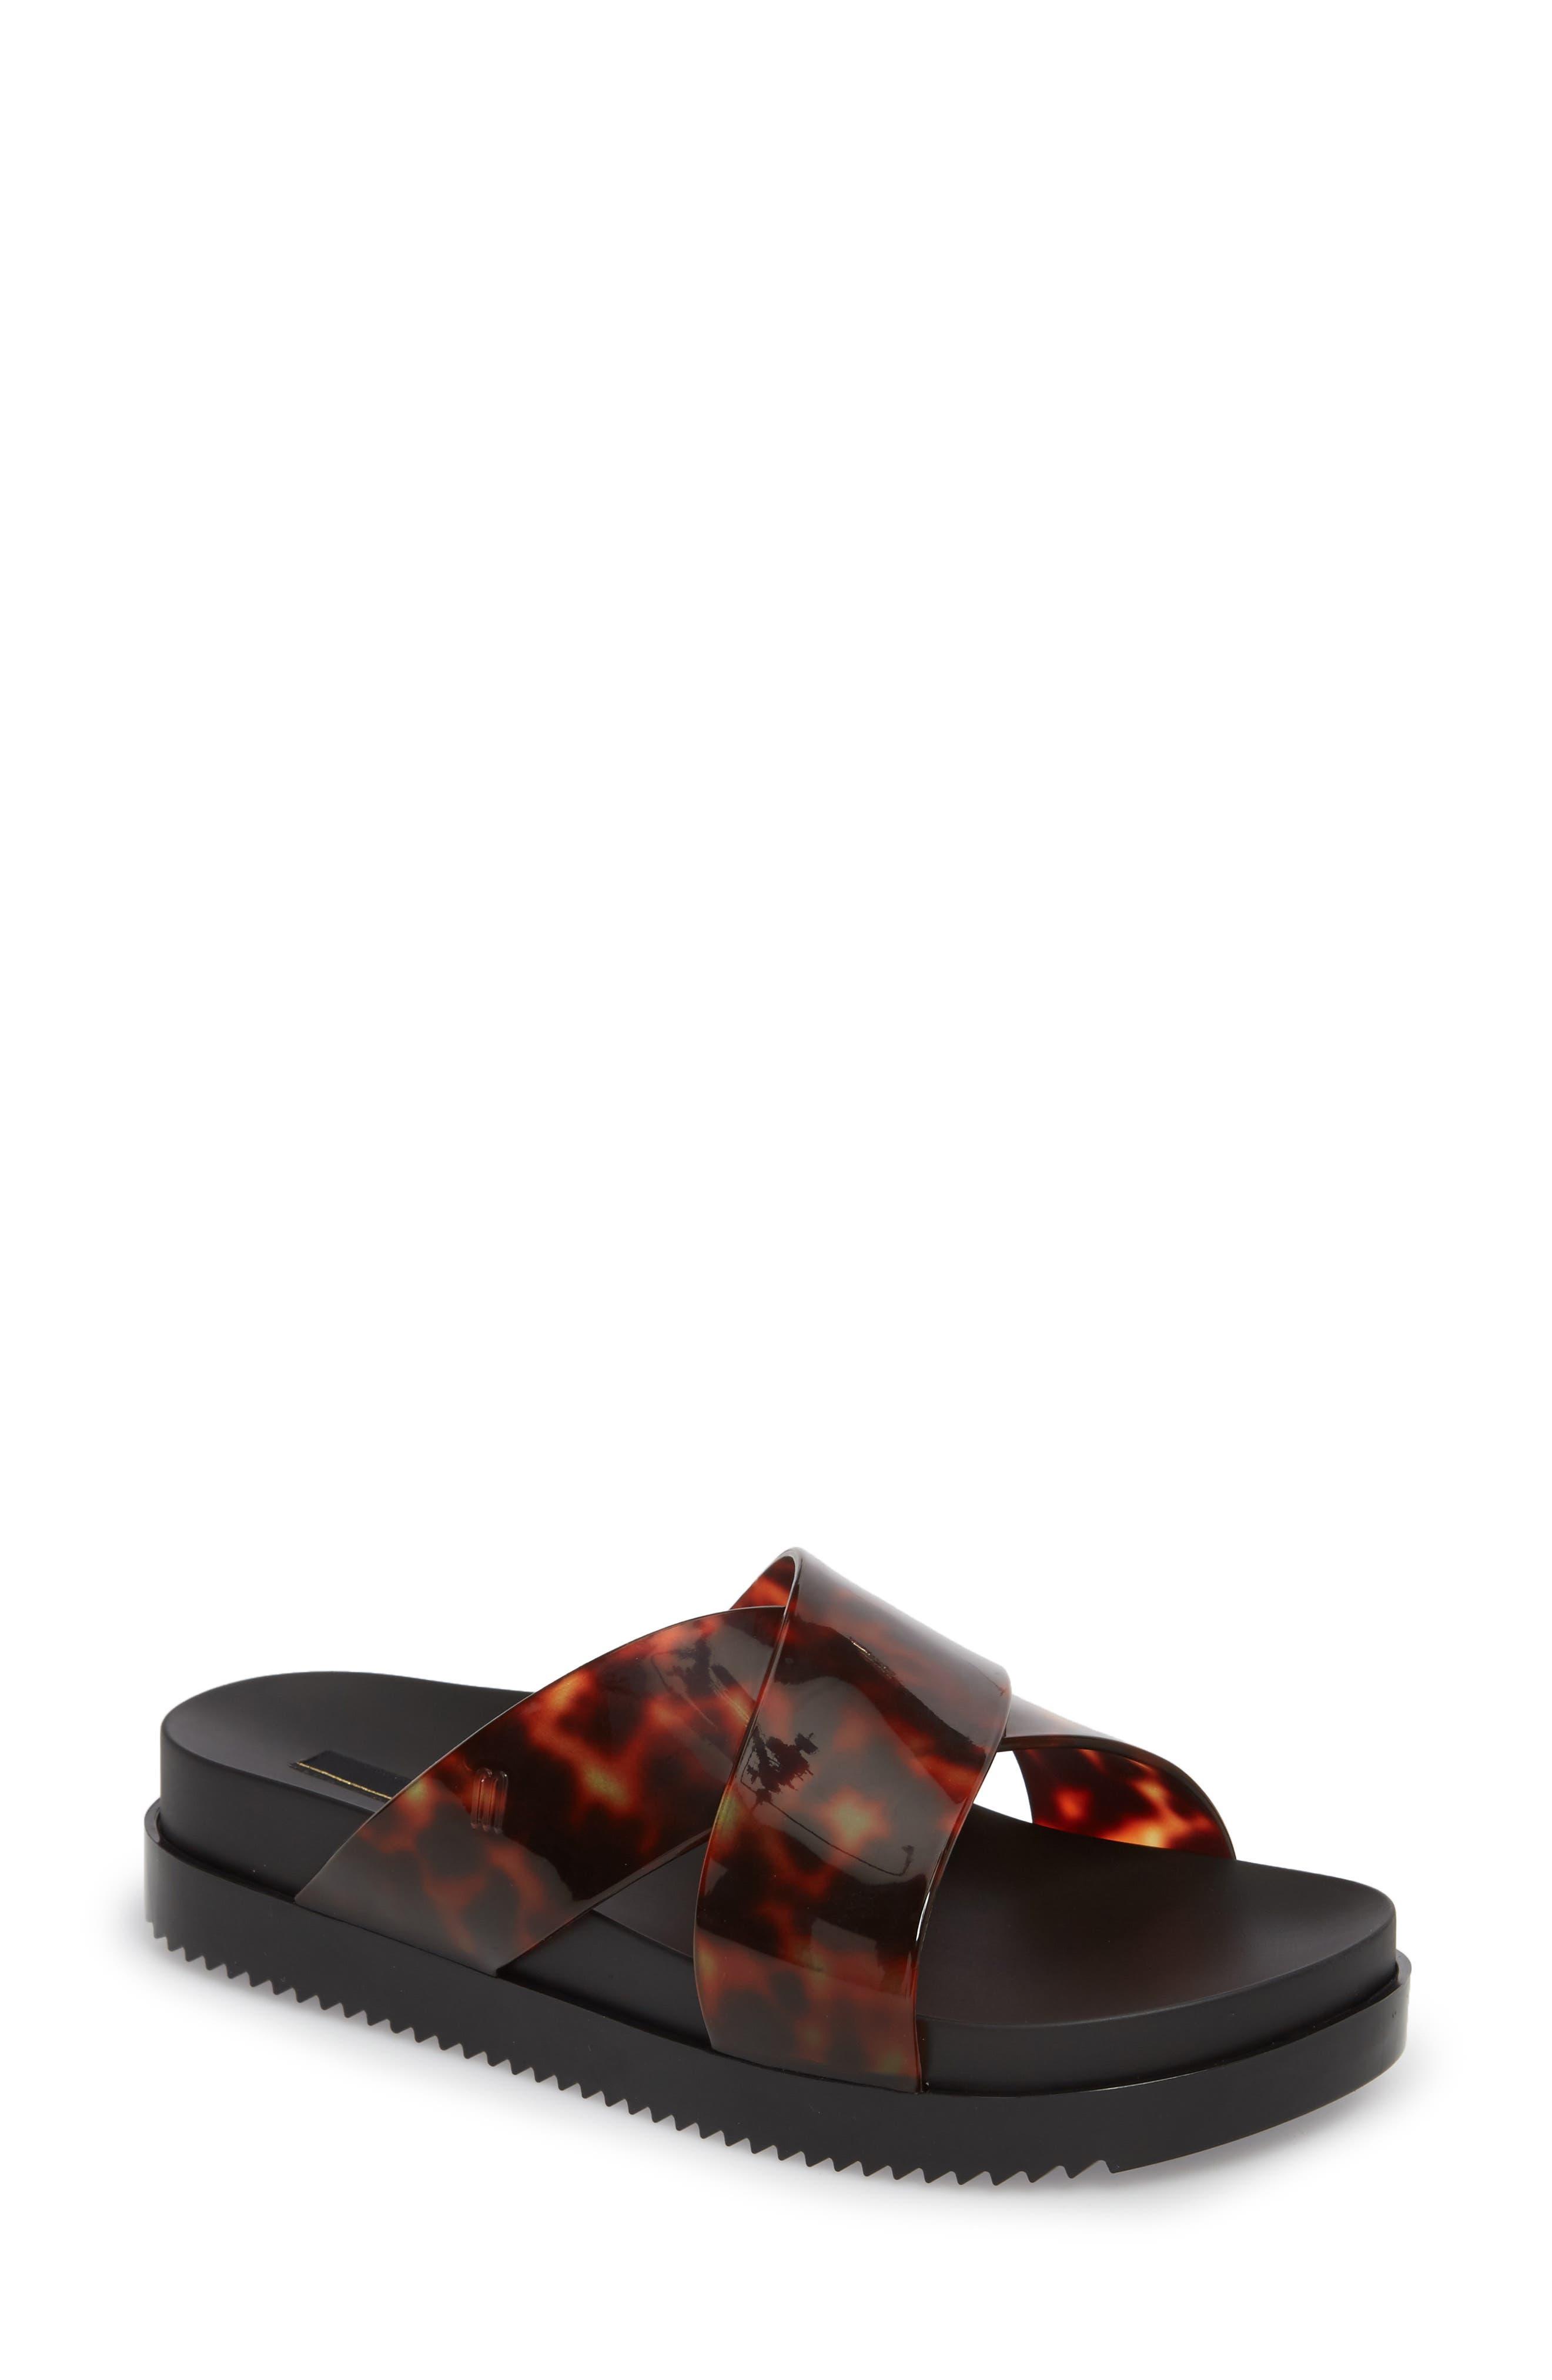 Cosmic II Sandal,                         Main,                         color, 200